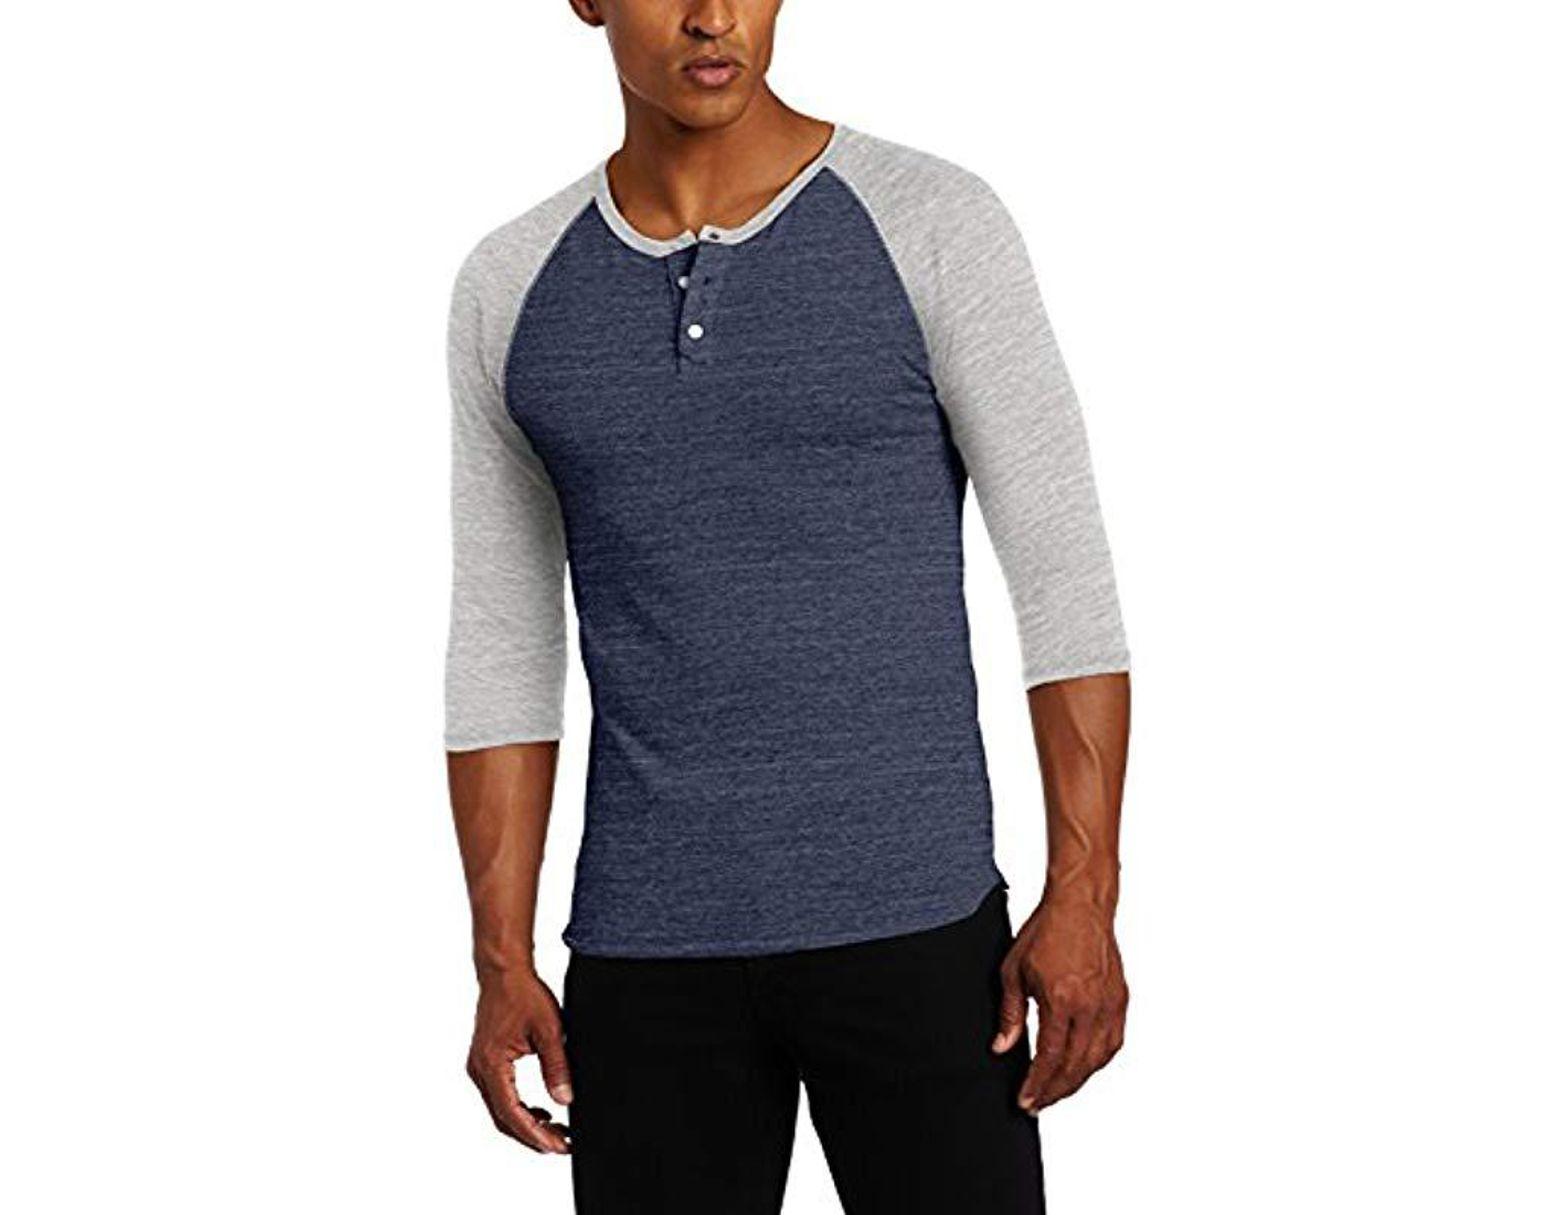 48716e0d Alternative Apparel Raglan 3/4 Sleeve Henley Shirt in Blue for Men - Save  60% - Lyst